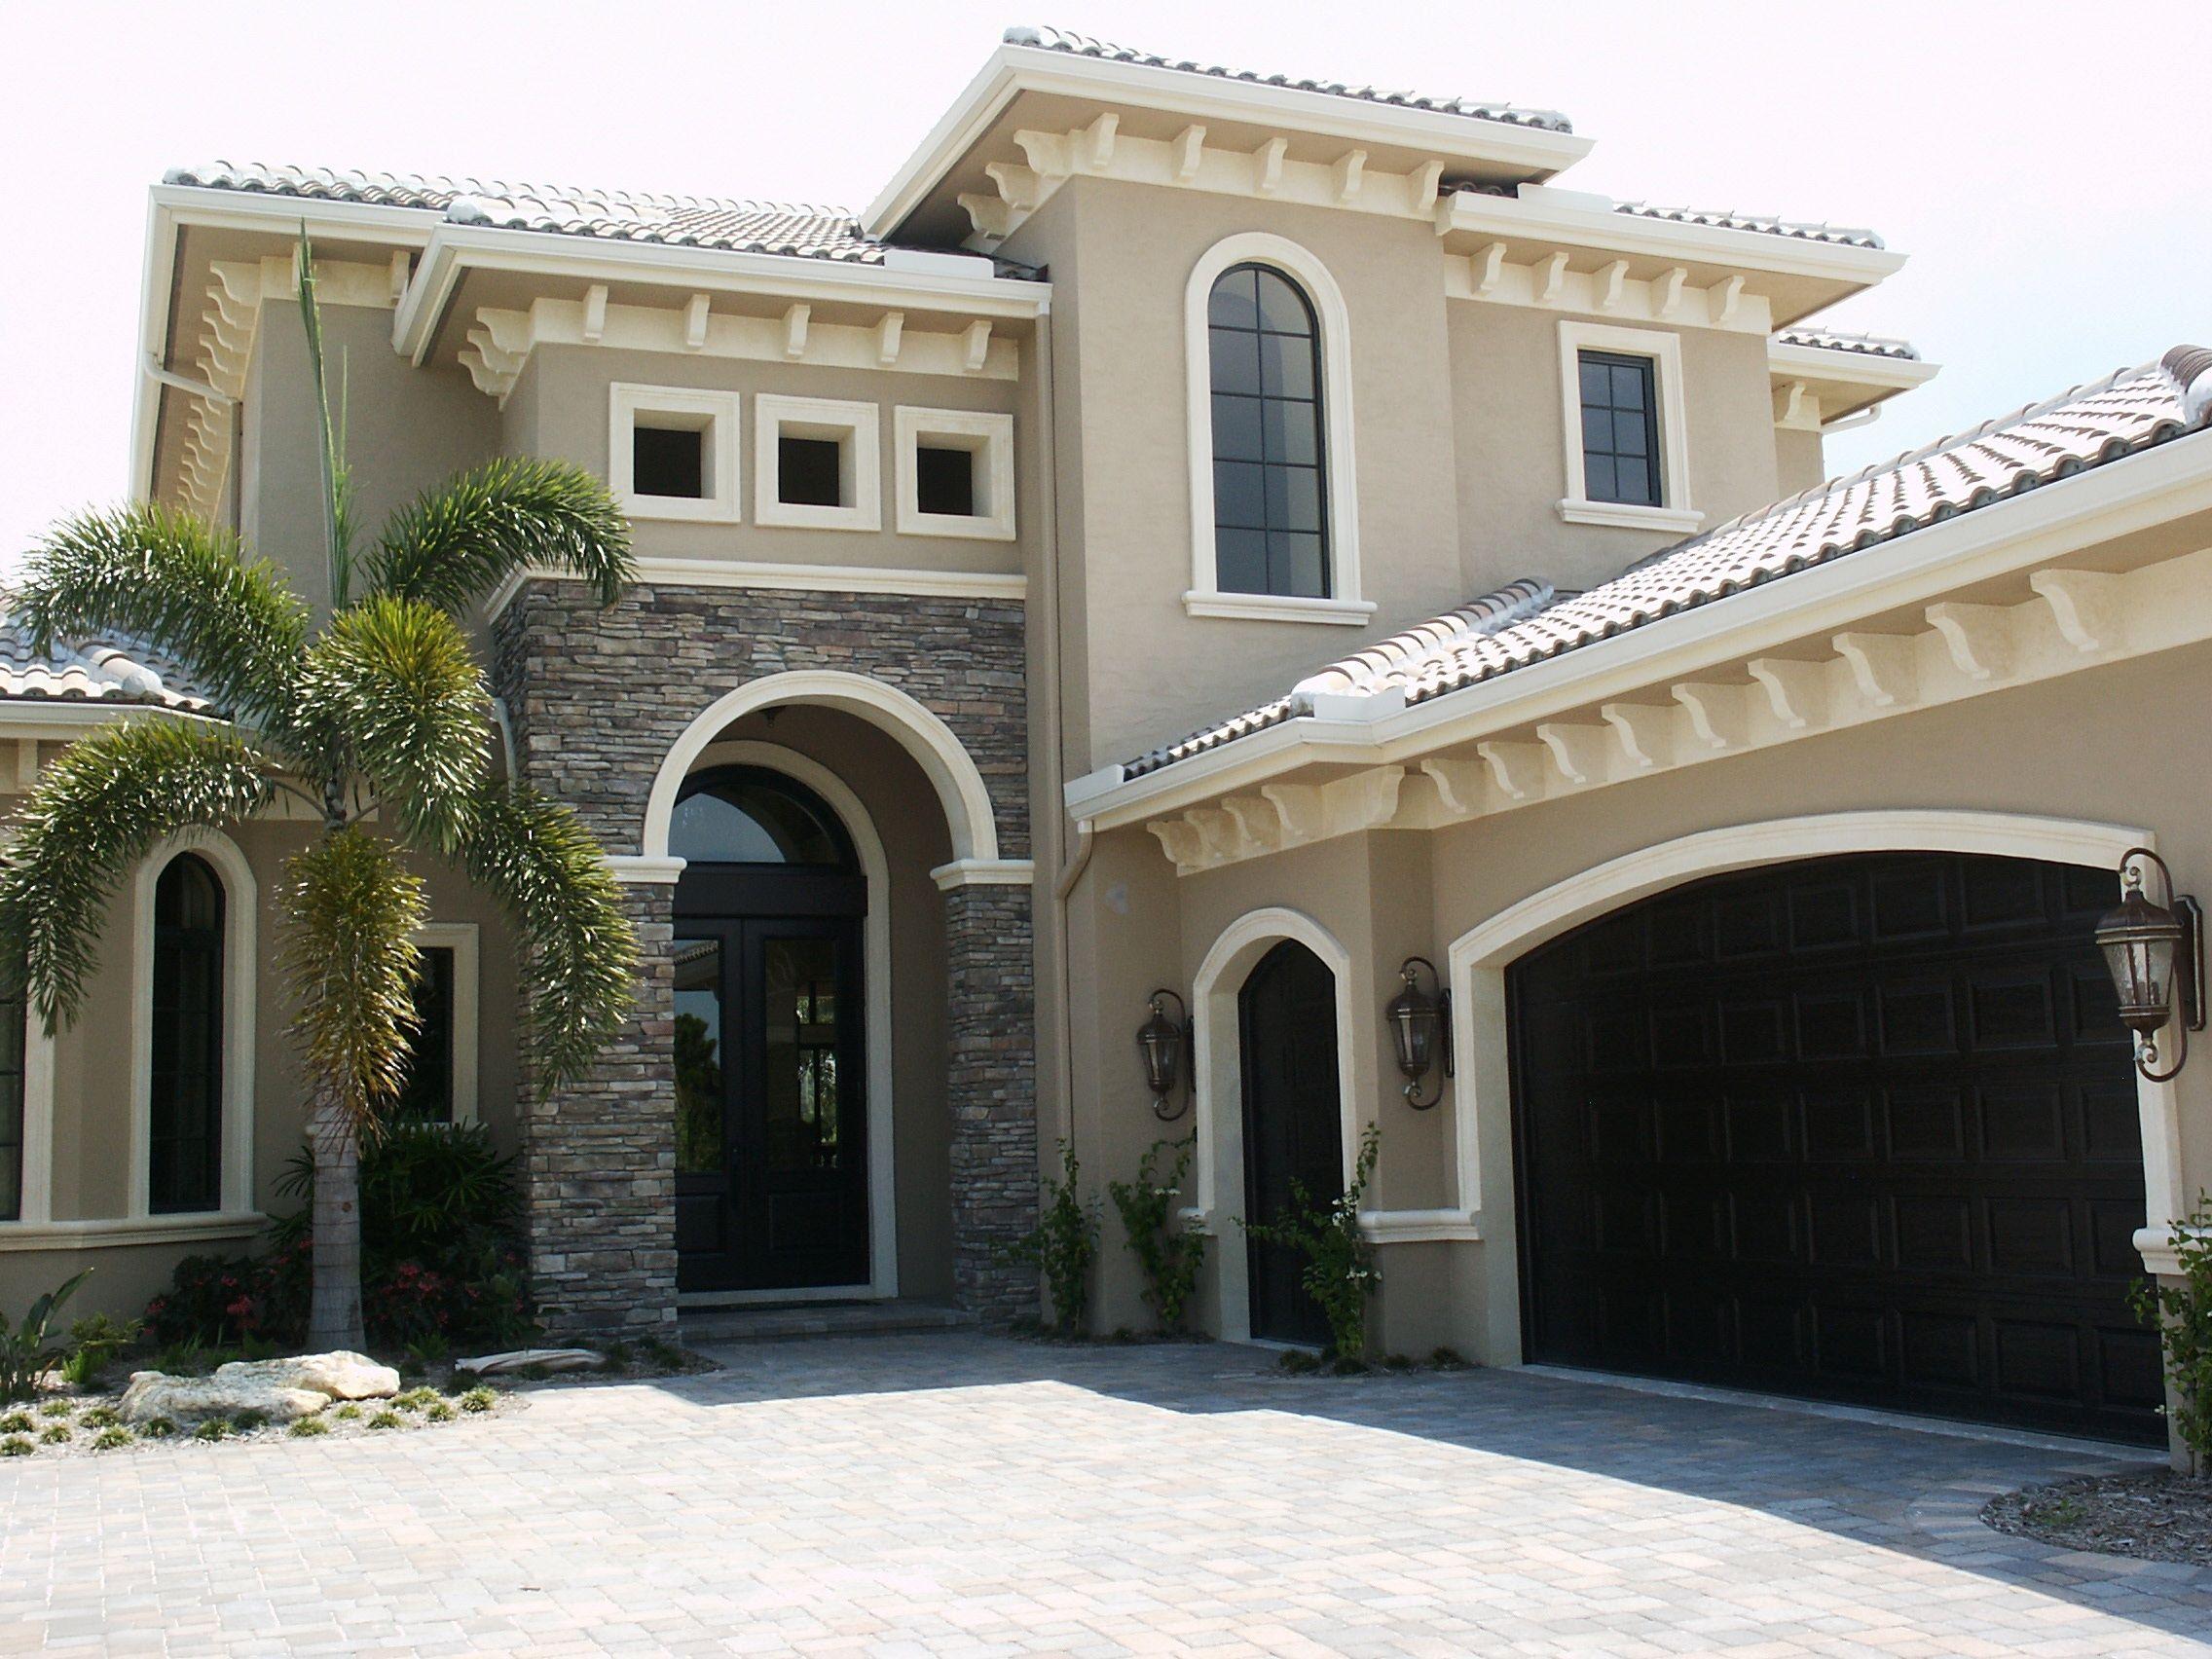 Best Ideas About Florida Homes Exterior On Pinterest - Florida home design